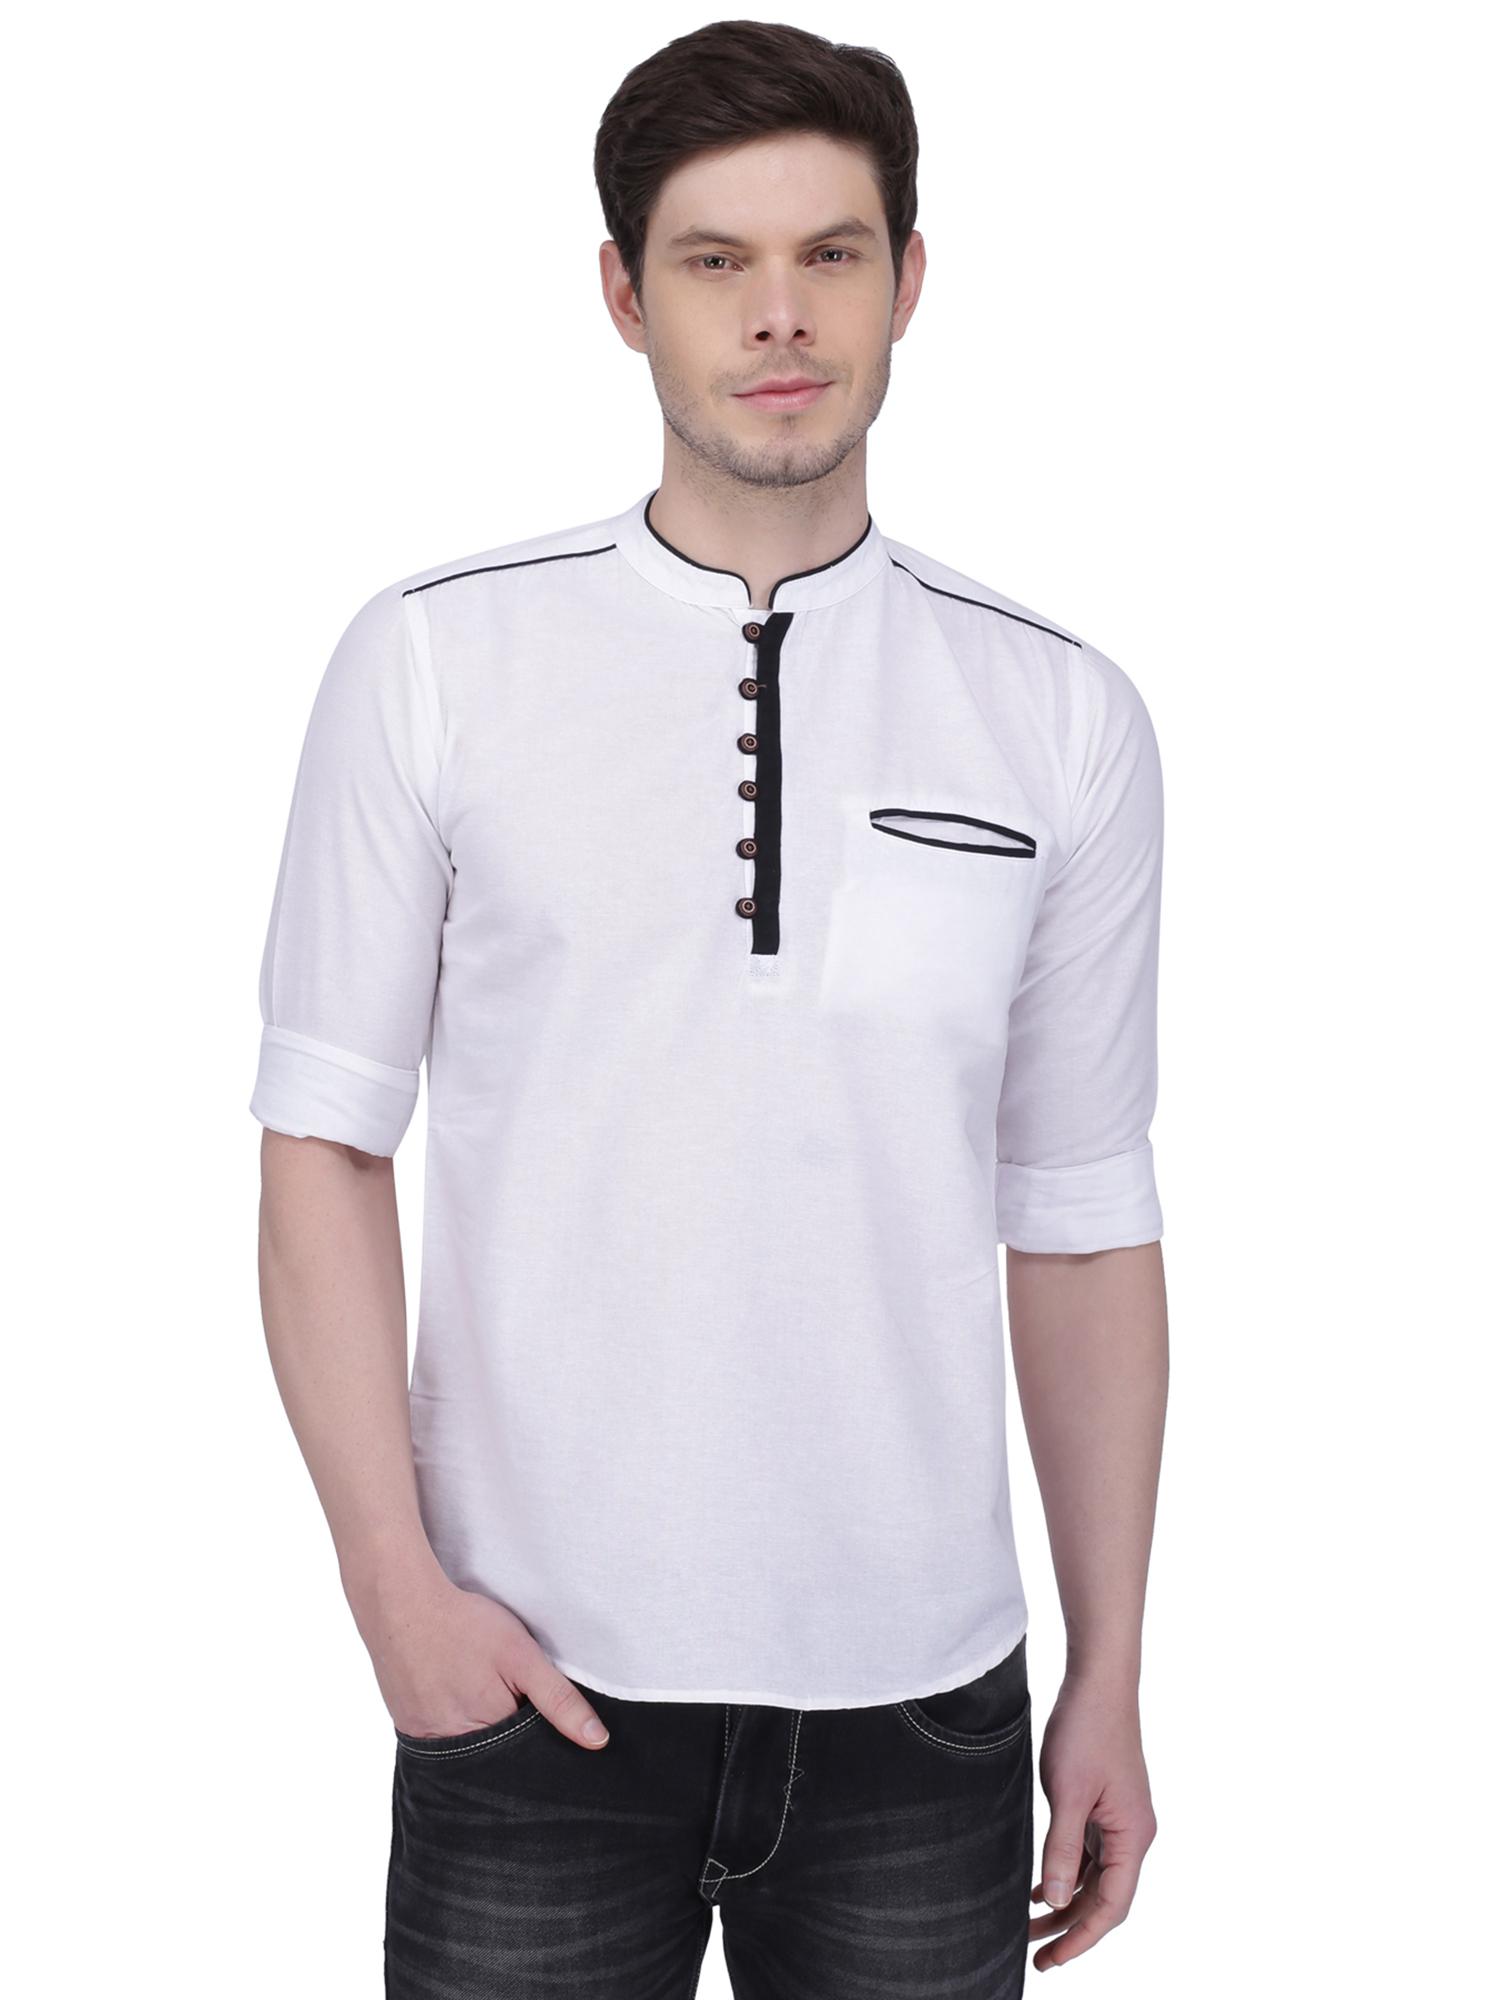 Kuons Avenue | Kuons Avenue Men's White Linen Cotton Short Kurta- KACLFS1154WH